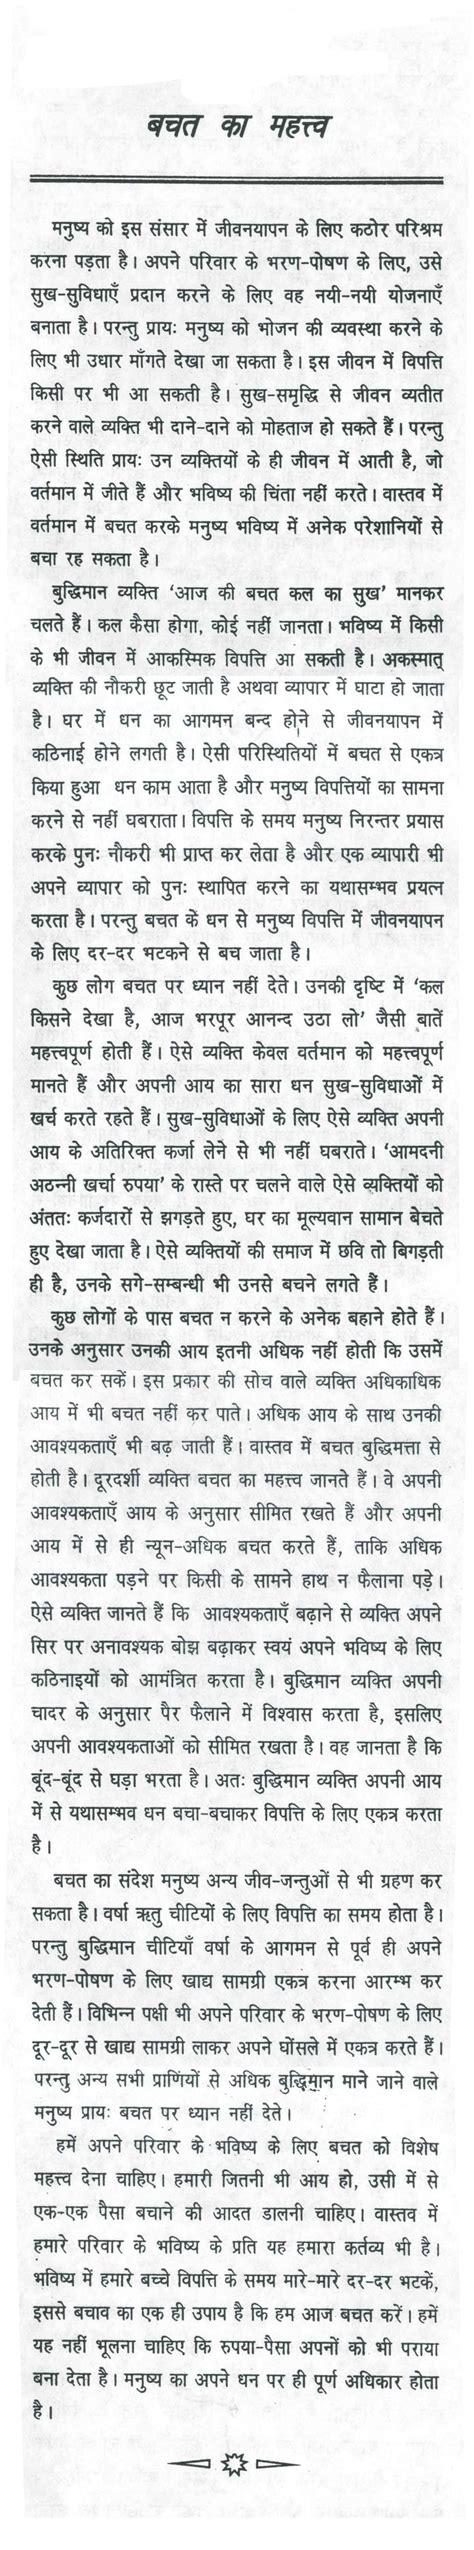 kanakadasa biography in hindi language simple essay on importance of water essay on importance